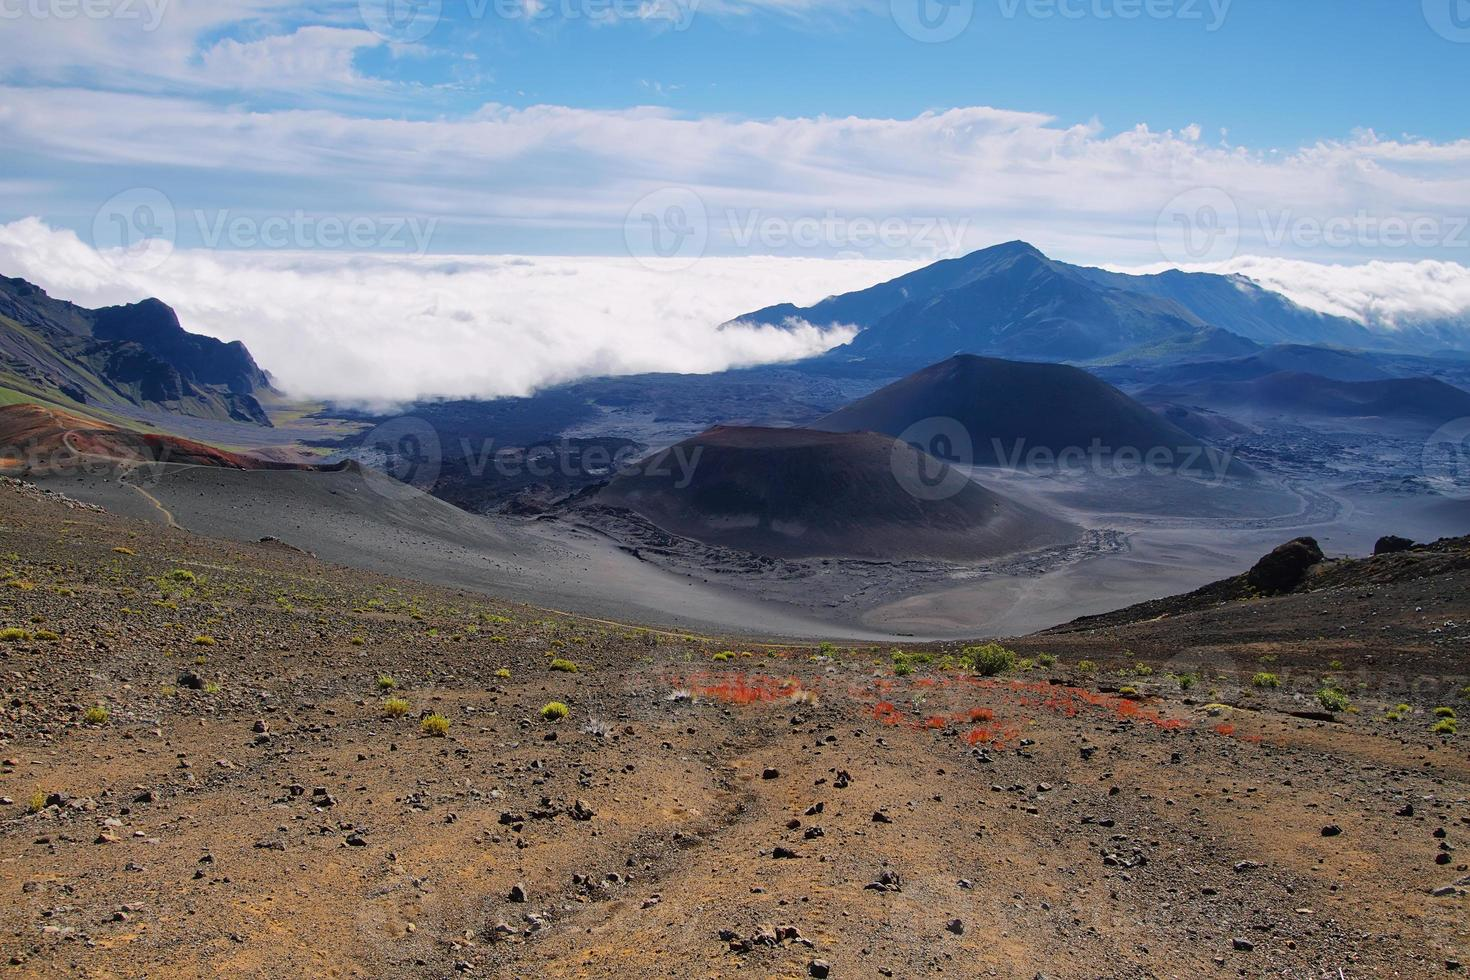 caldera del volcán haleakala en la isla de maui foto